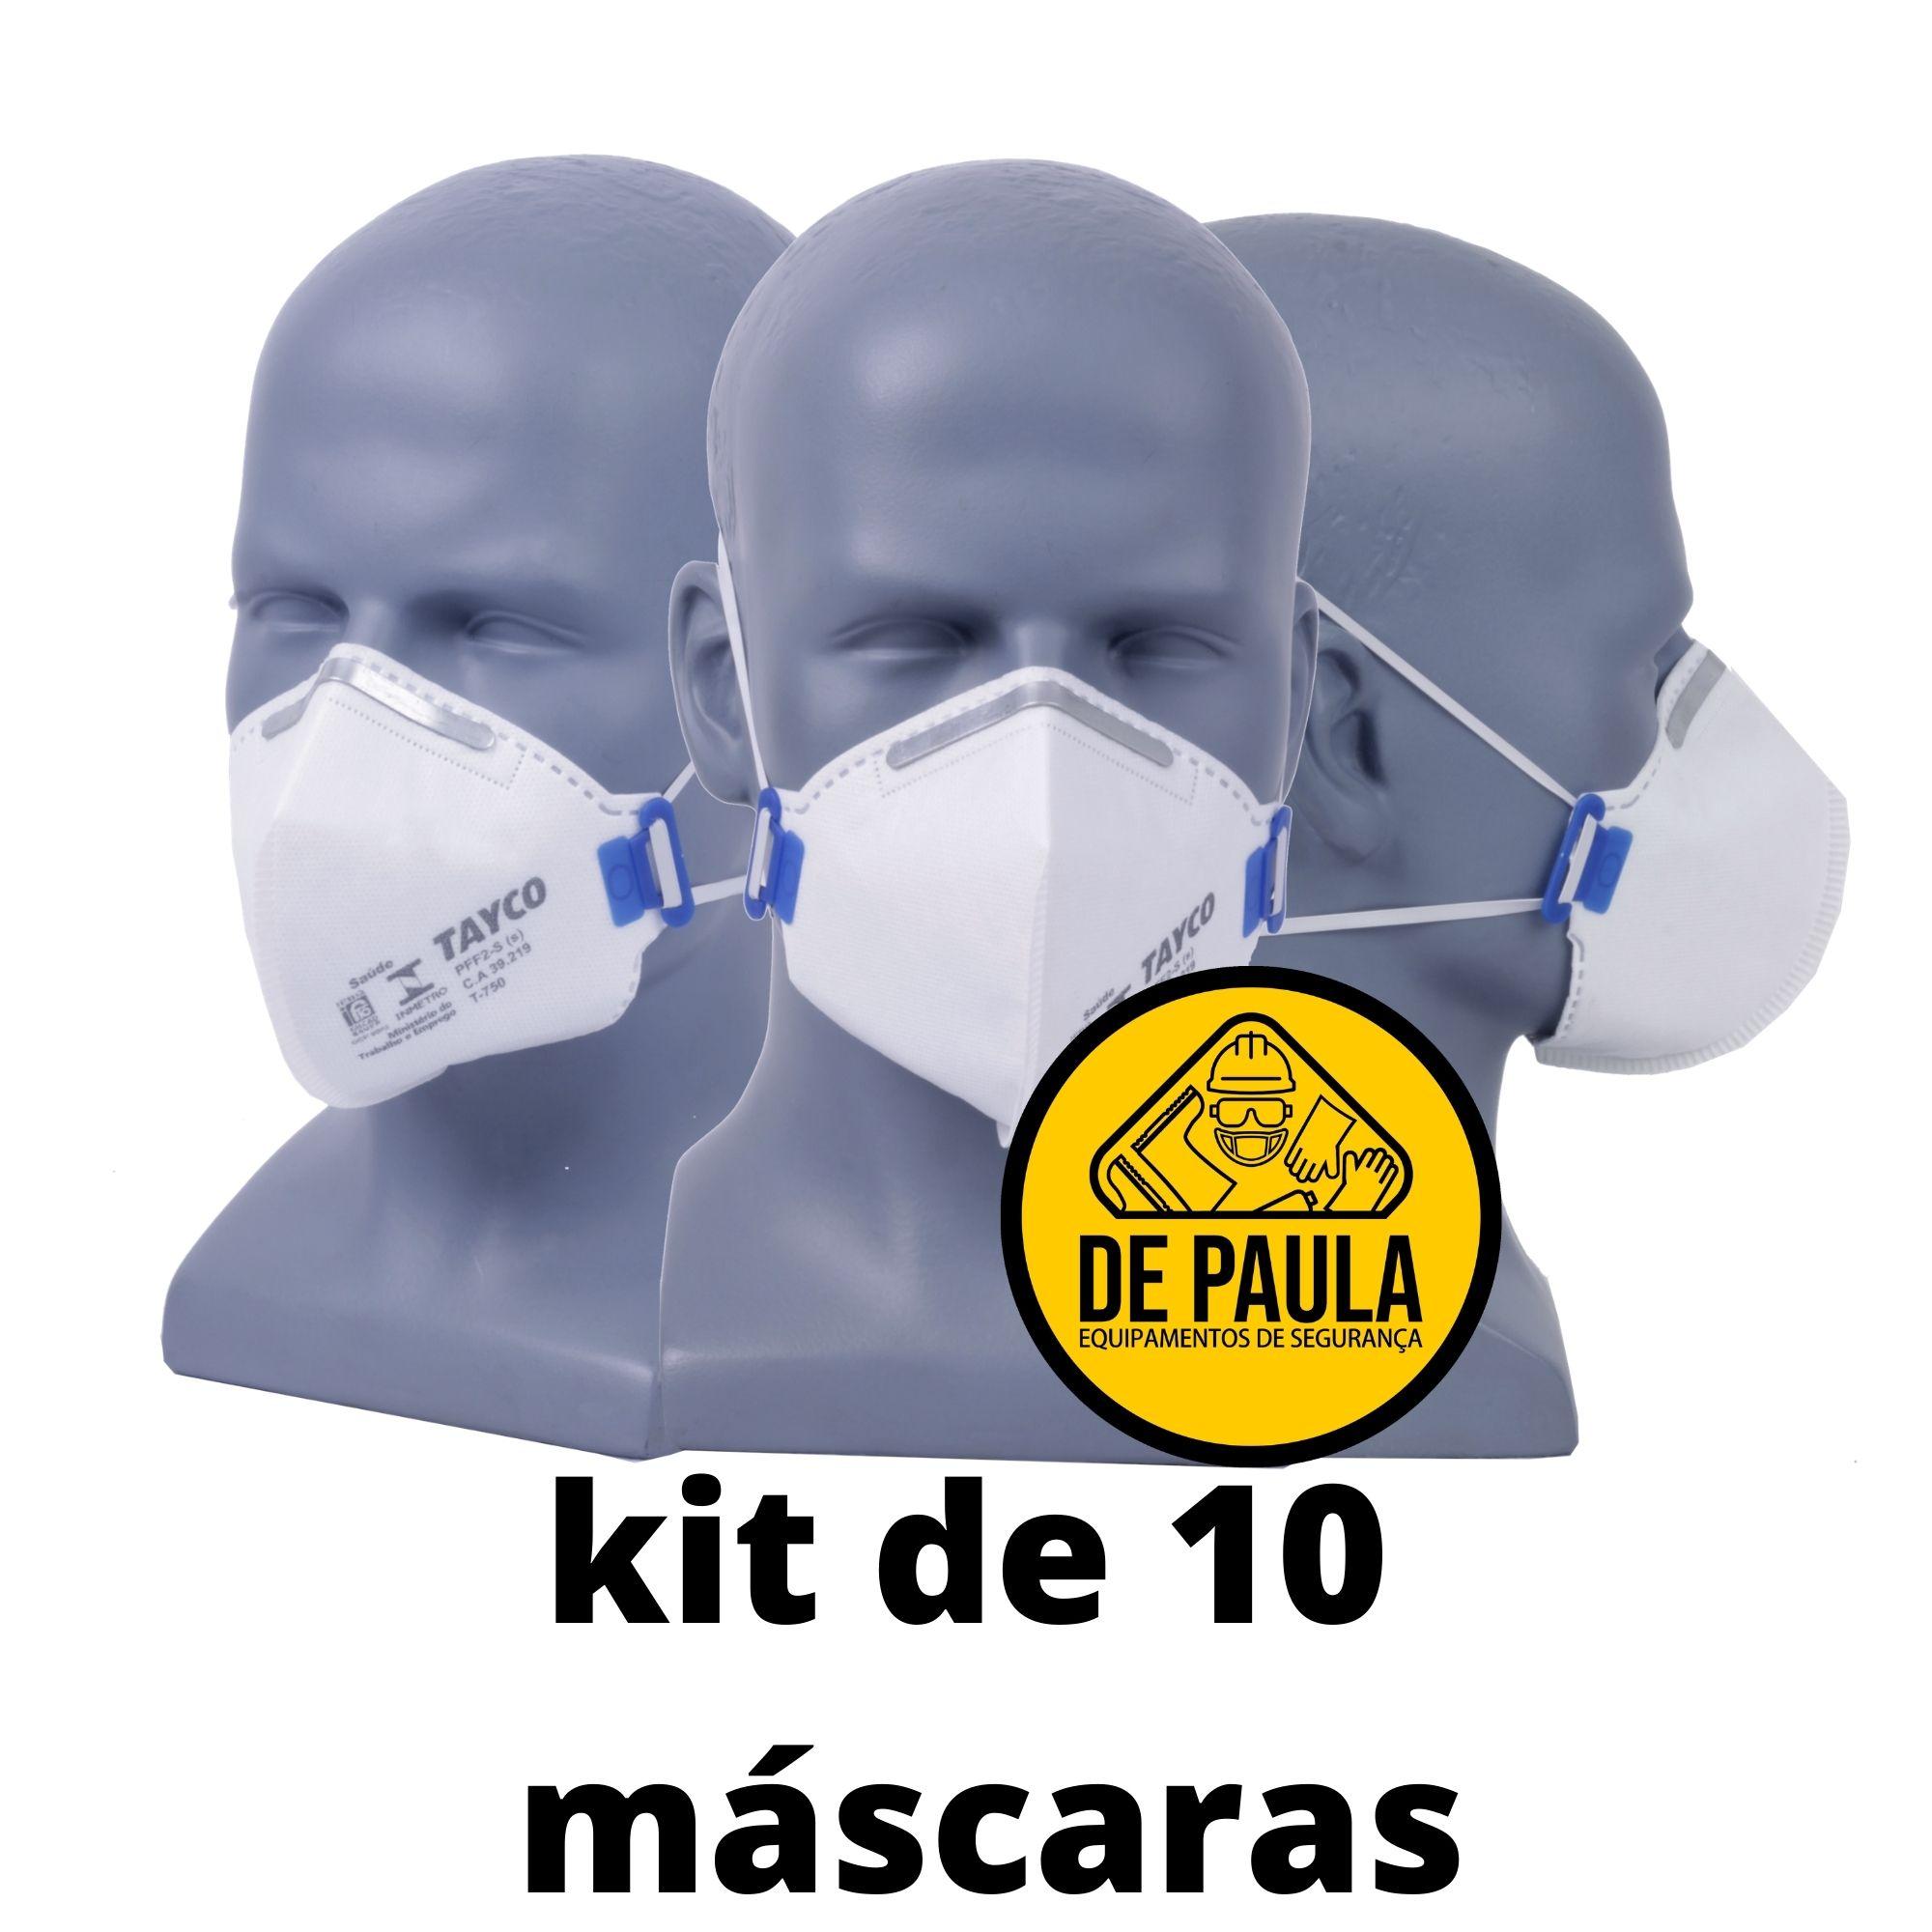 kit de 10 unid - Mascara descartavel Pff2 -S sem valvula BRANCA TAYCO  - DE PAULA EPI